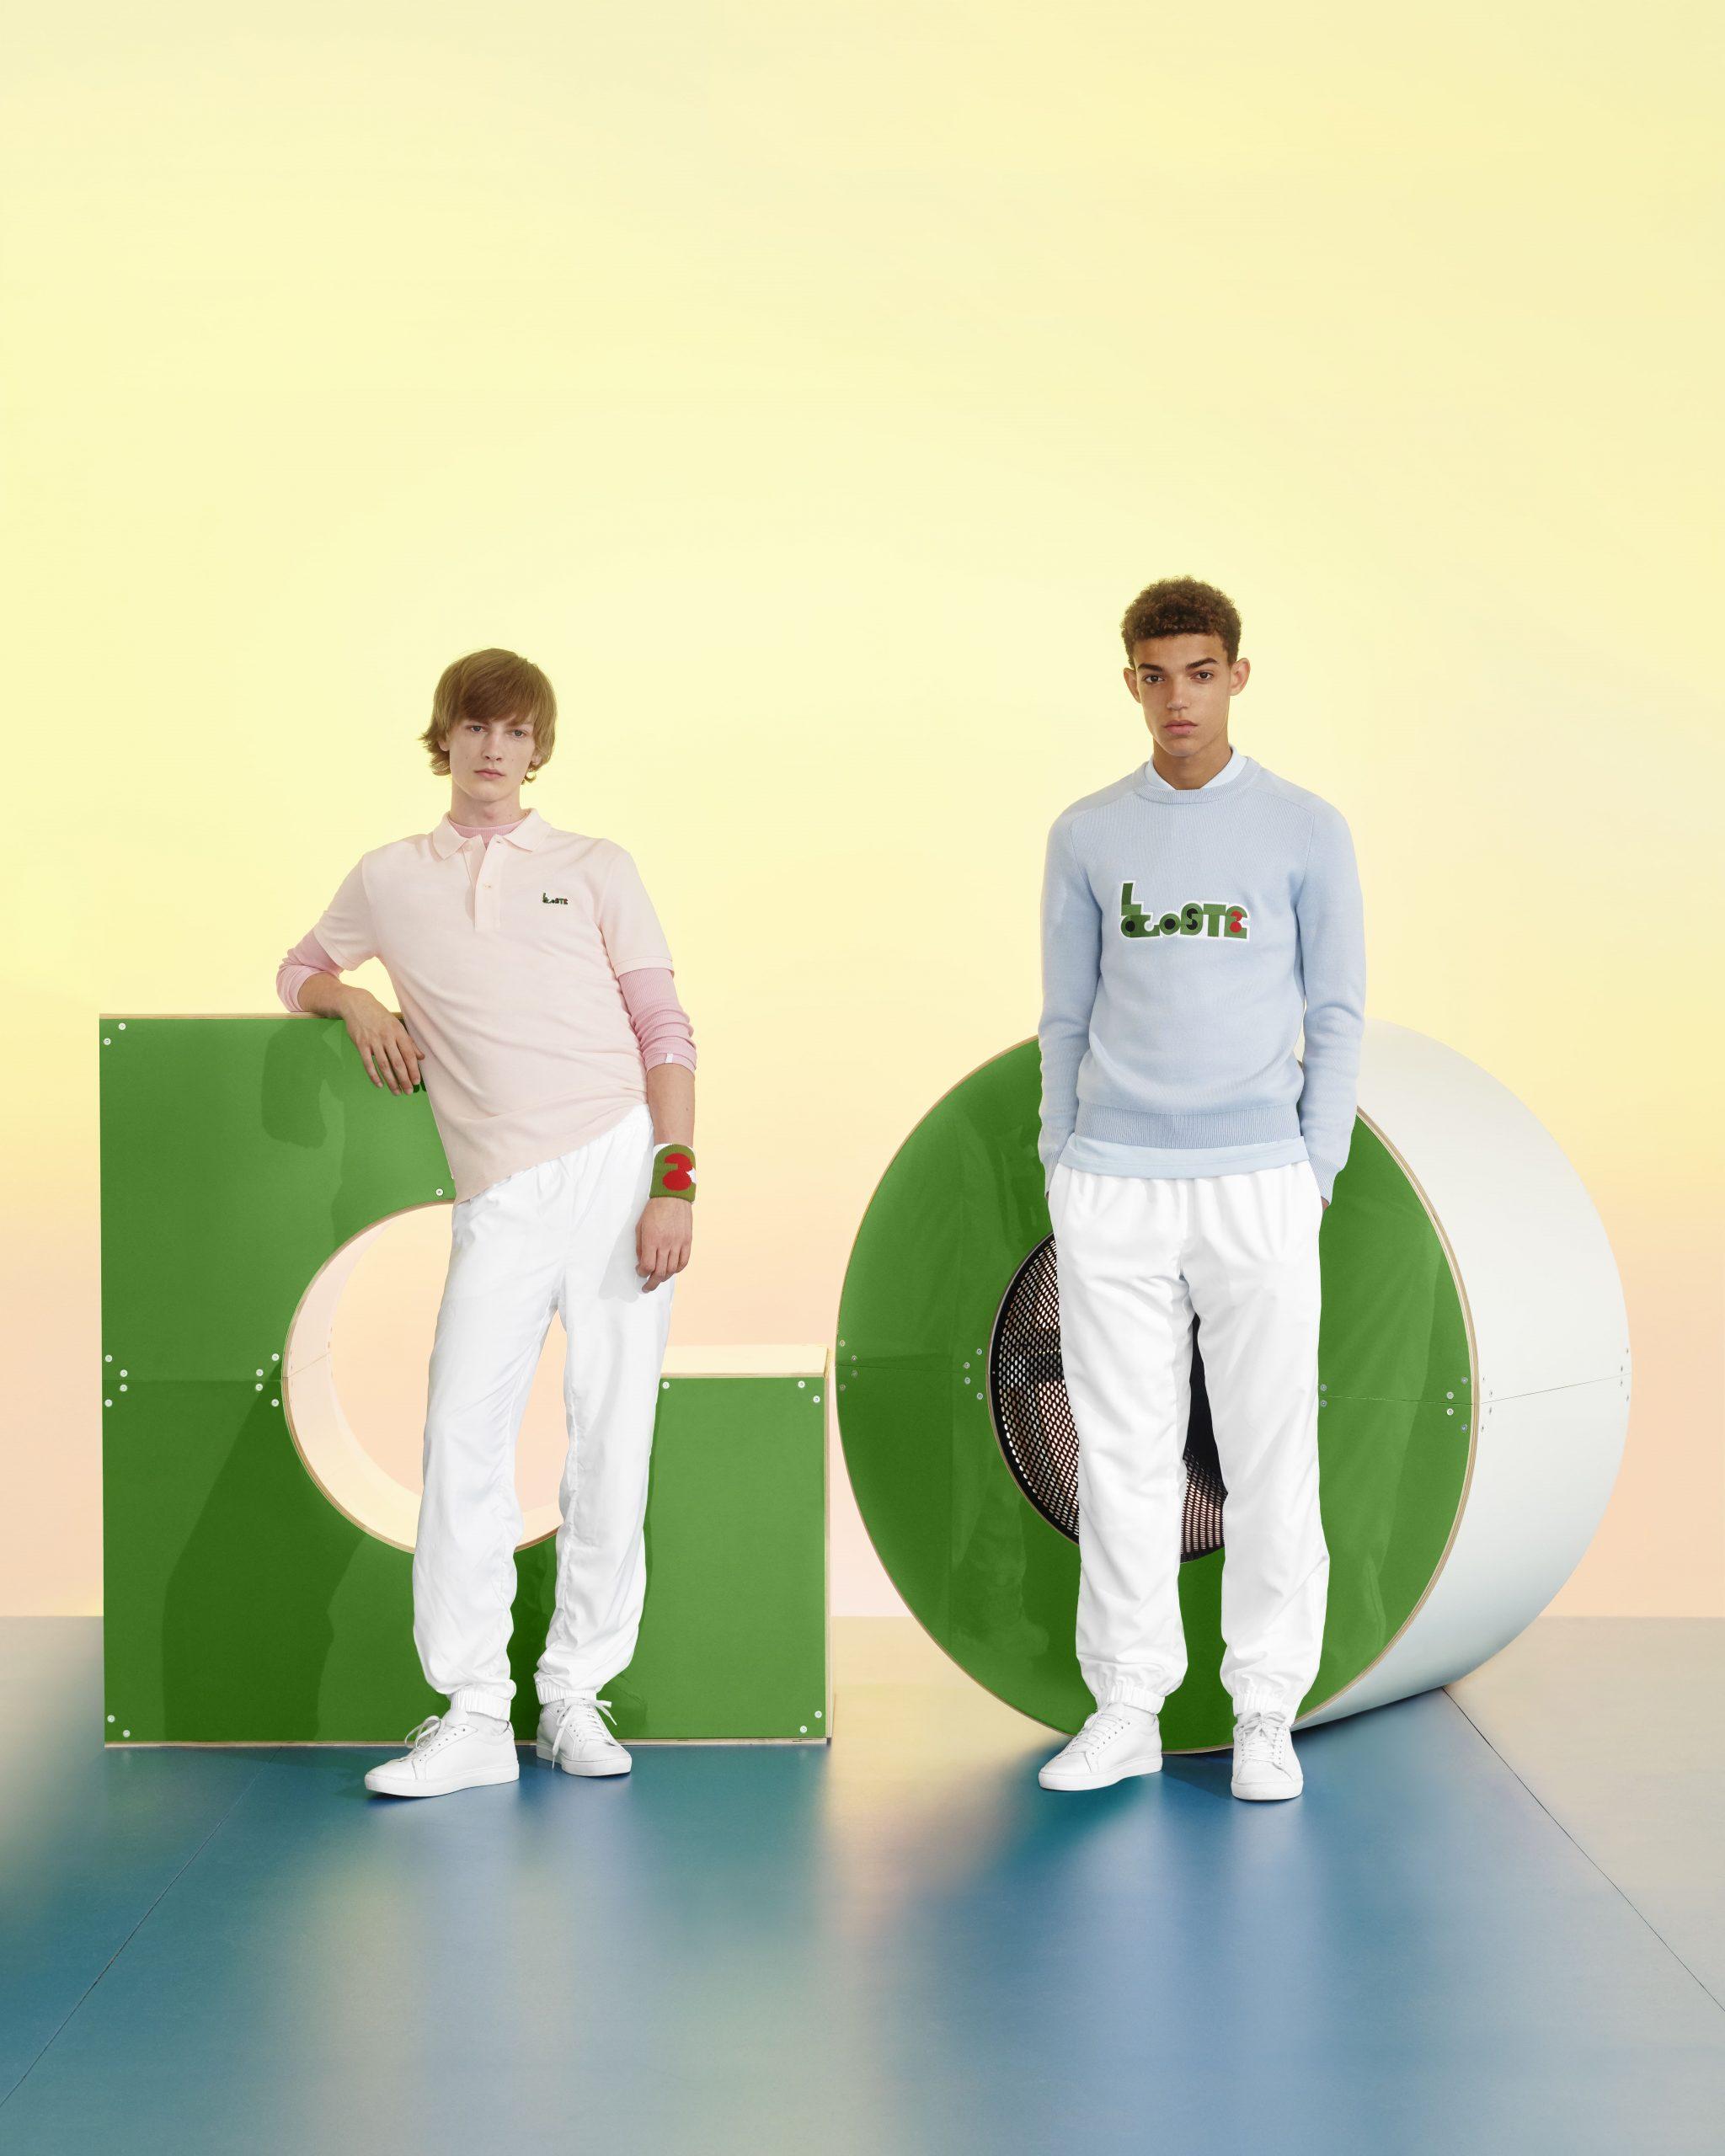 Lacoste X M/M (Paris): The Iconic Logo Revisited Lacoste X M/M (Paris): The Iconic Logo Revisited Vanity Teen 虚荣青年 Menswear & new faces magazine